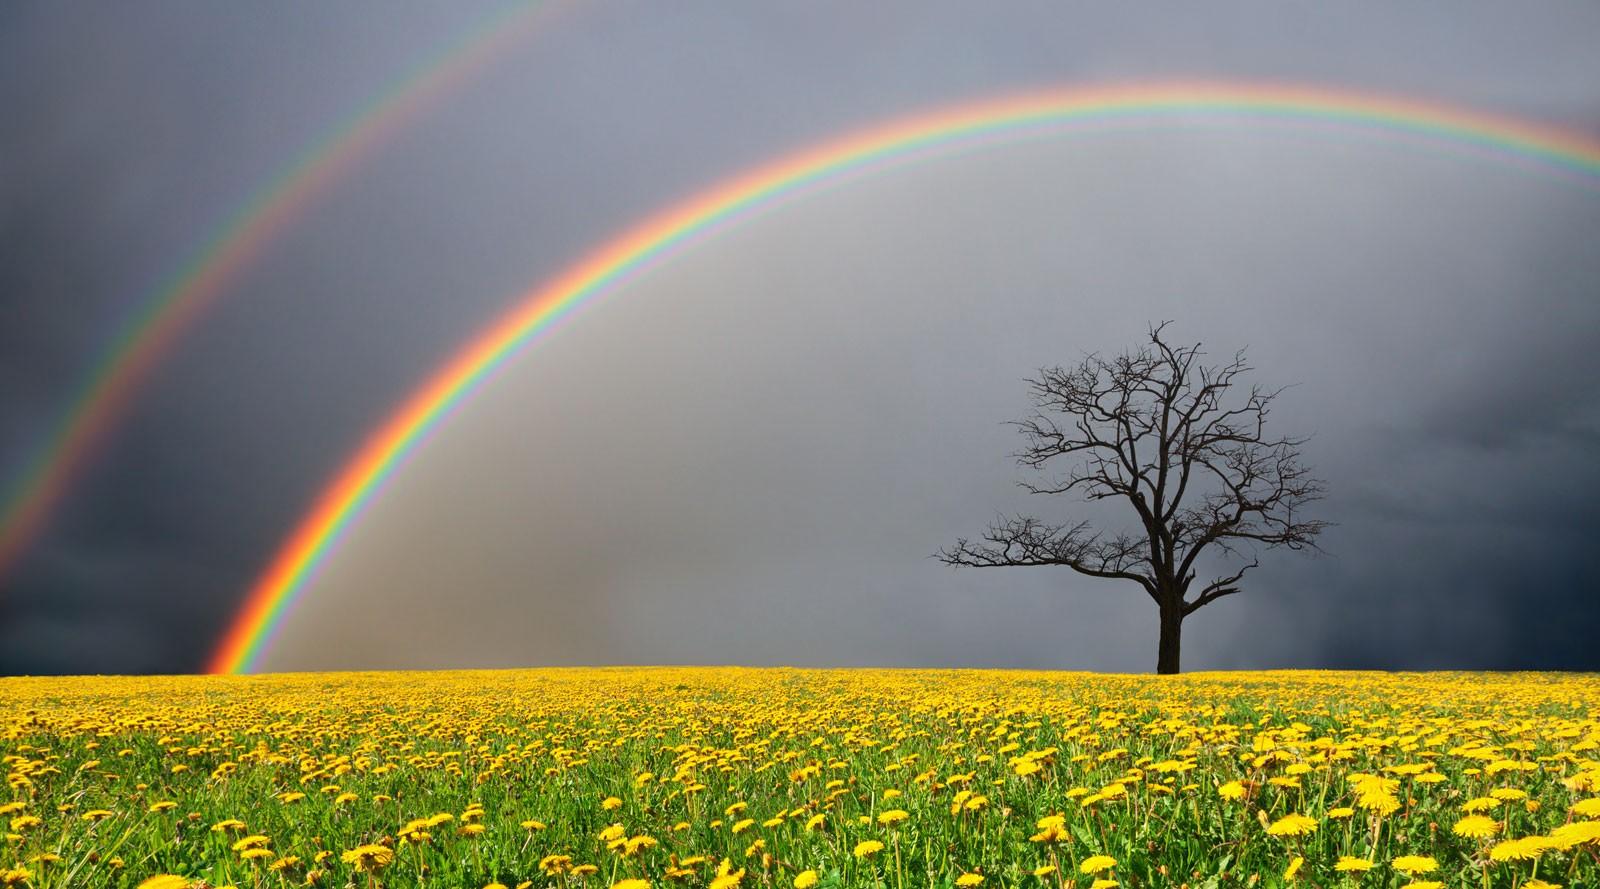 symbolic meaning of rainbows